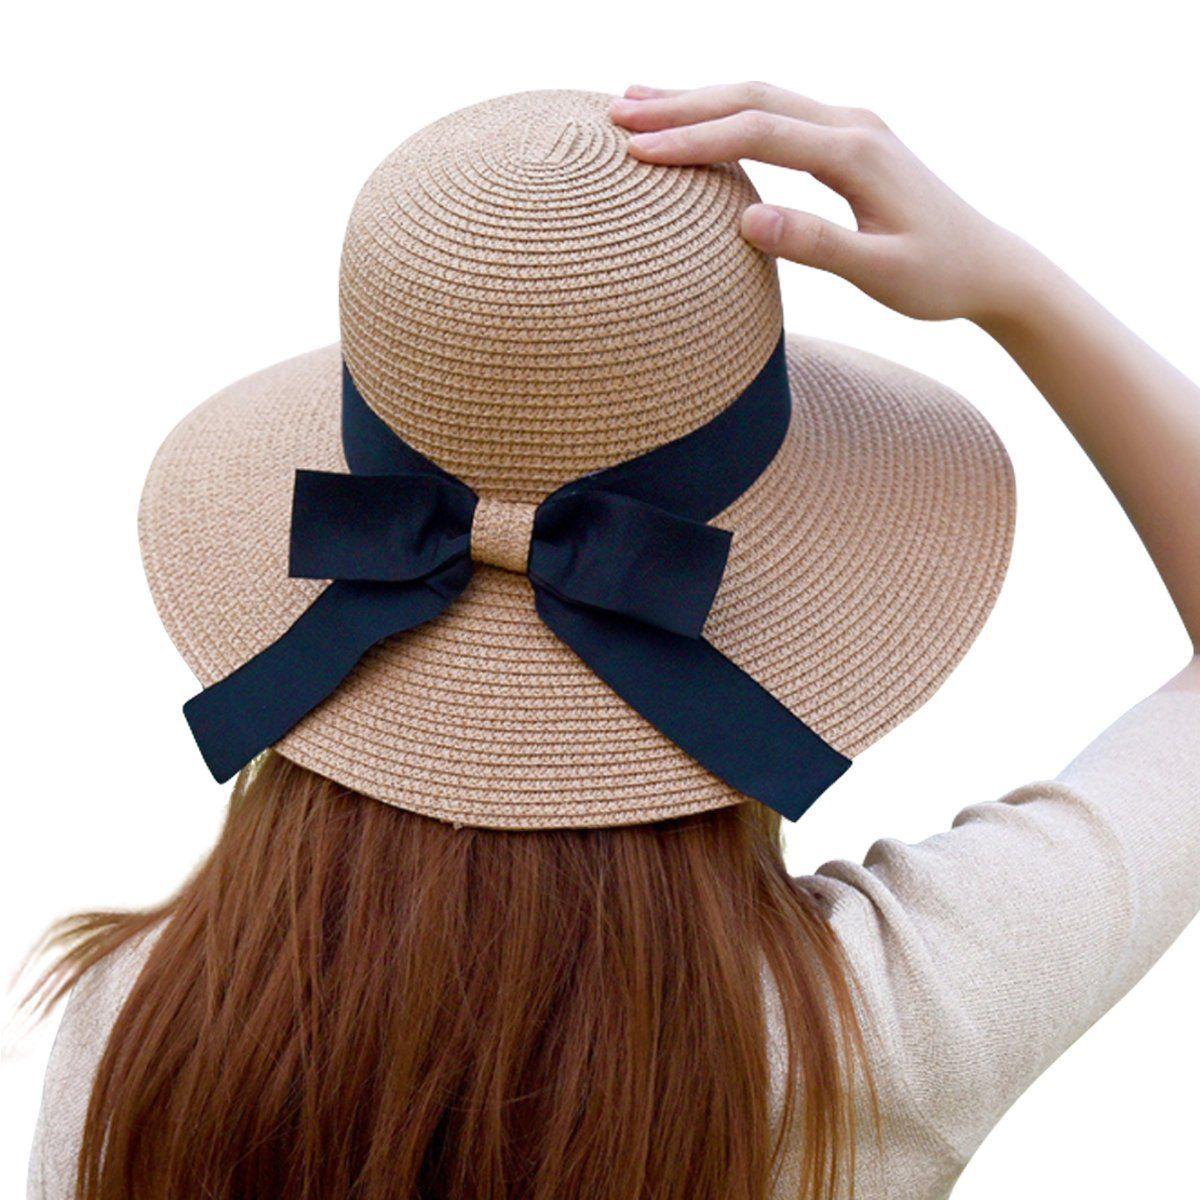 a57e7a7ede572  14.99 Lanzom Women Wide Brim Straw Panama Roll up Hat Fedora Beach Sun Hat  UPF50+ (Blue) at Amazon Women s Clothing store